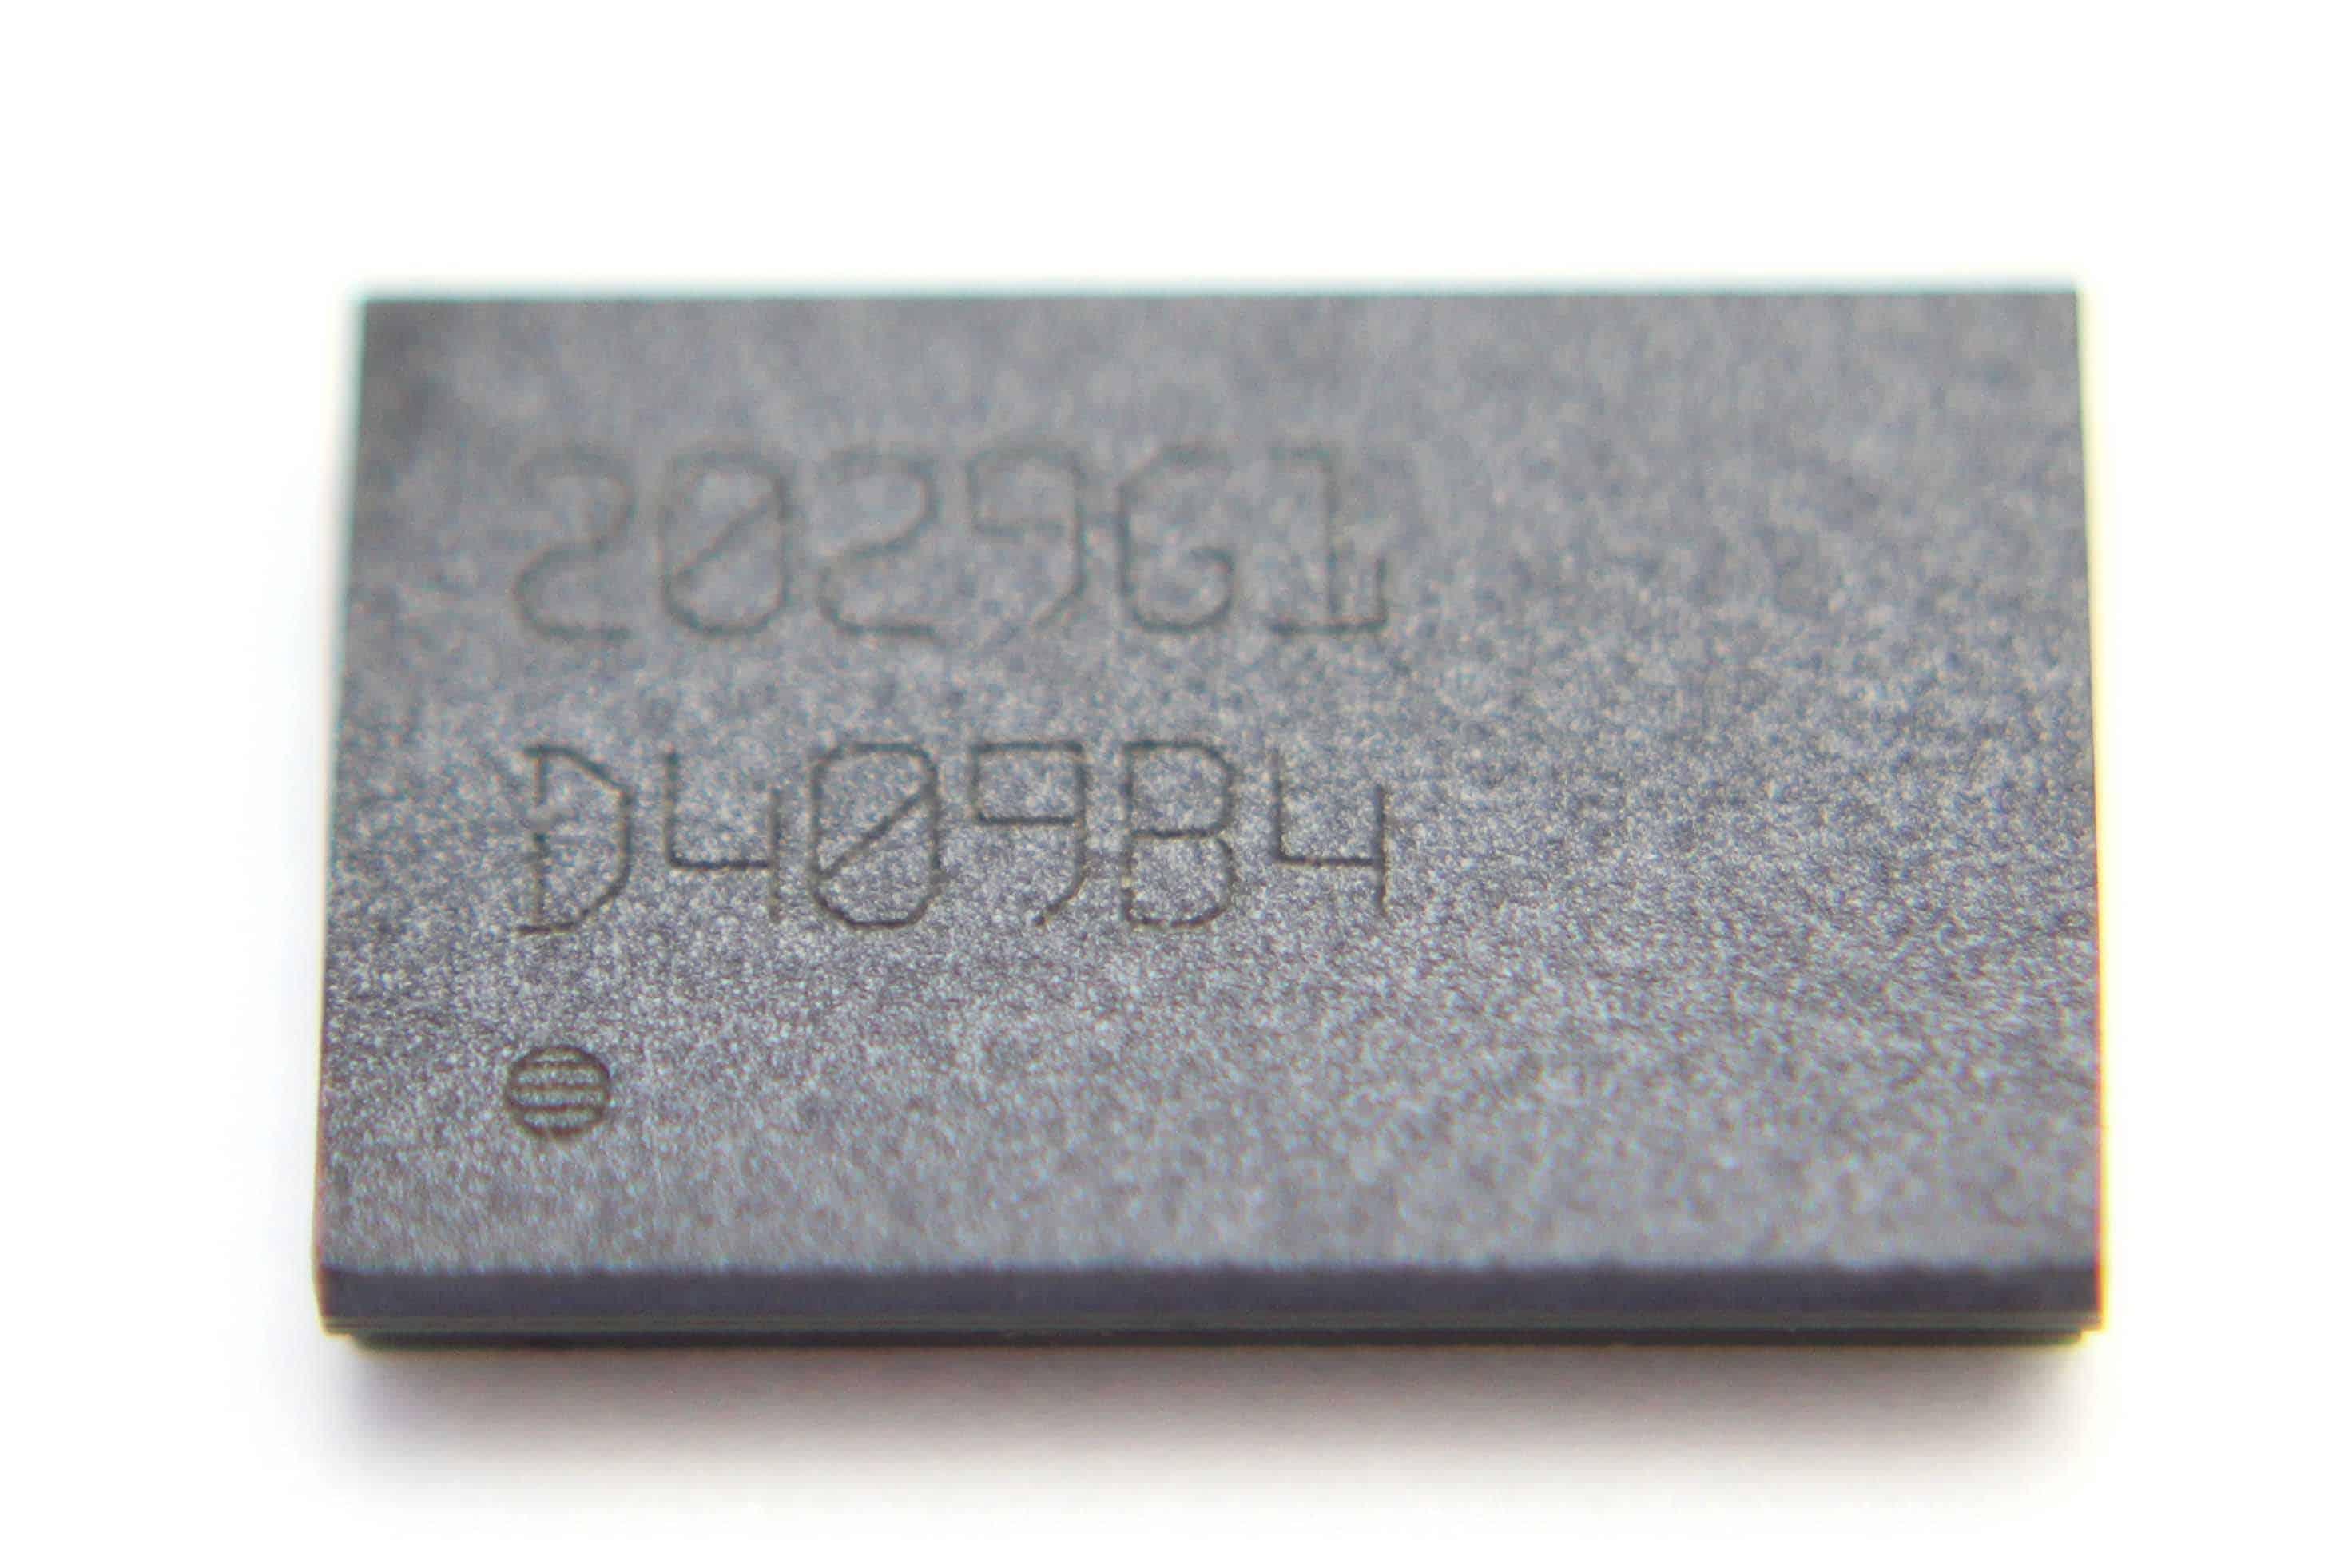 Samsung S4 I9500 I9505 Bluetooth WiFi IC Module